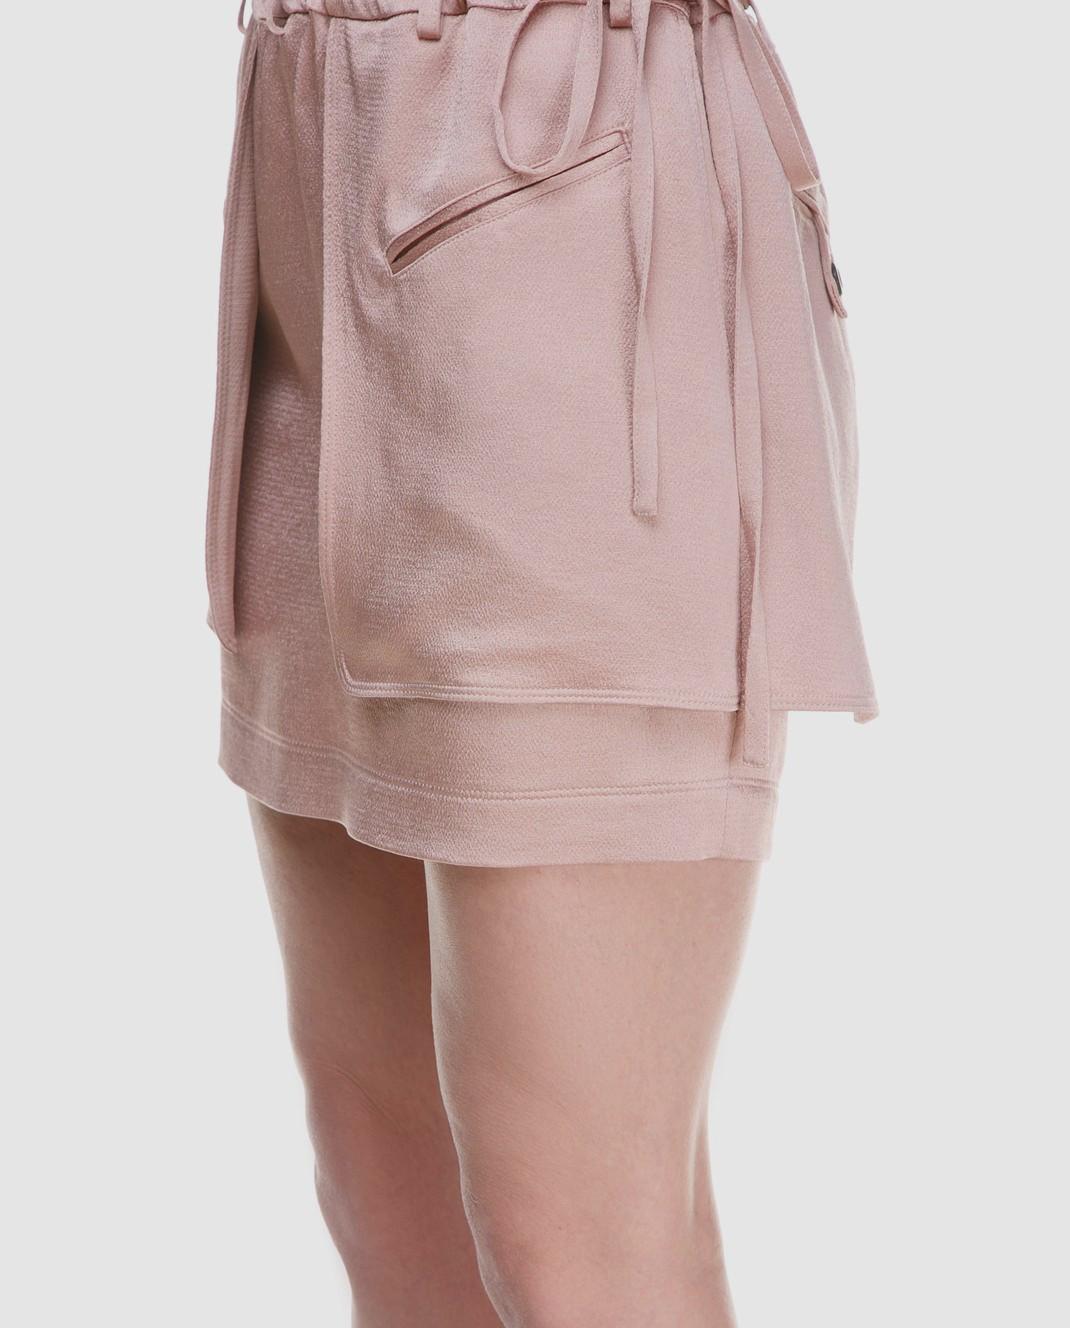 Valentino Розовая юбка PB0RA3K53H3 изображение 3